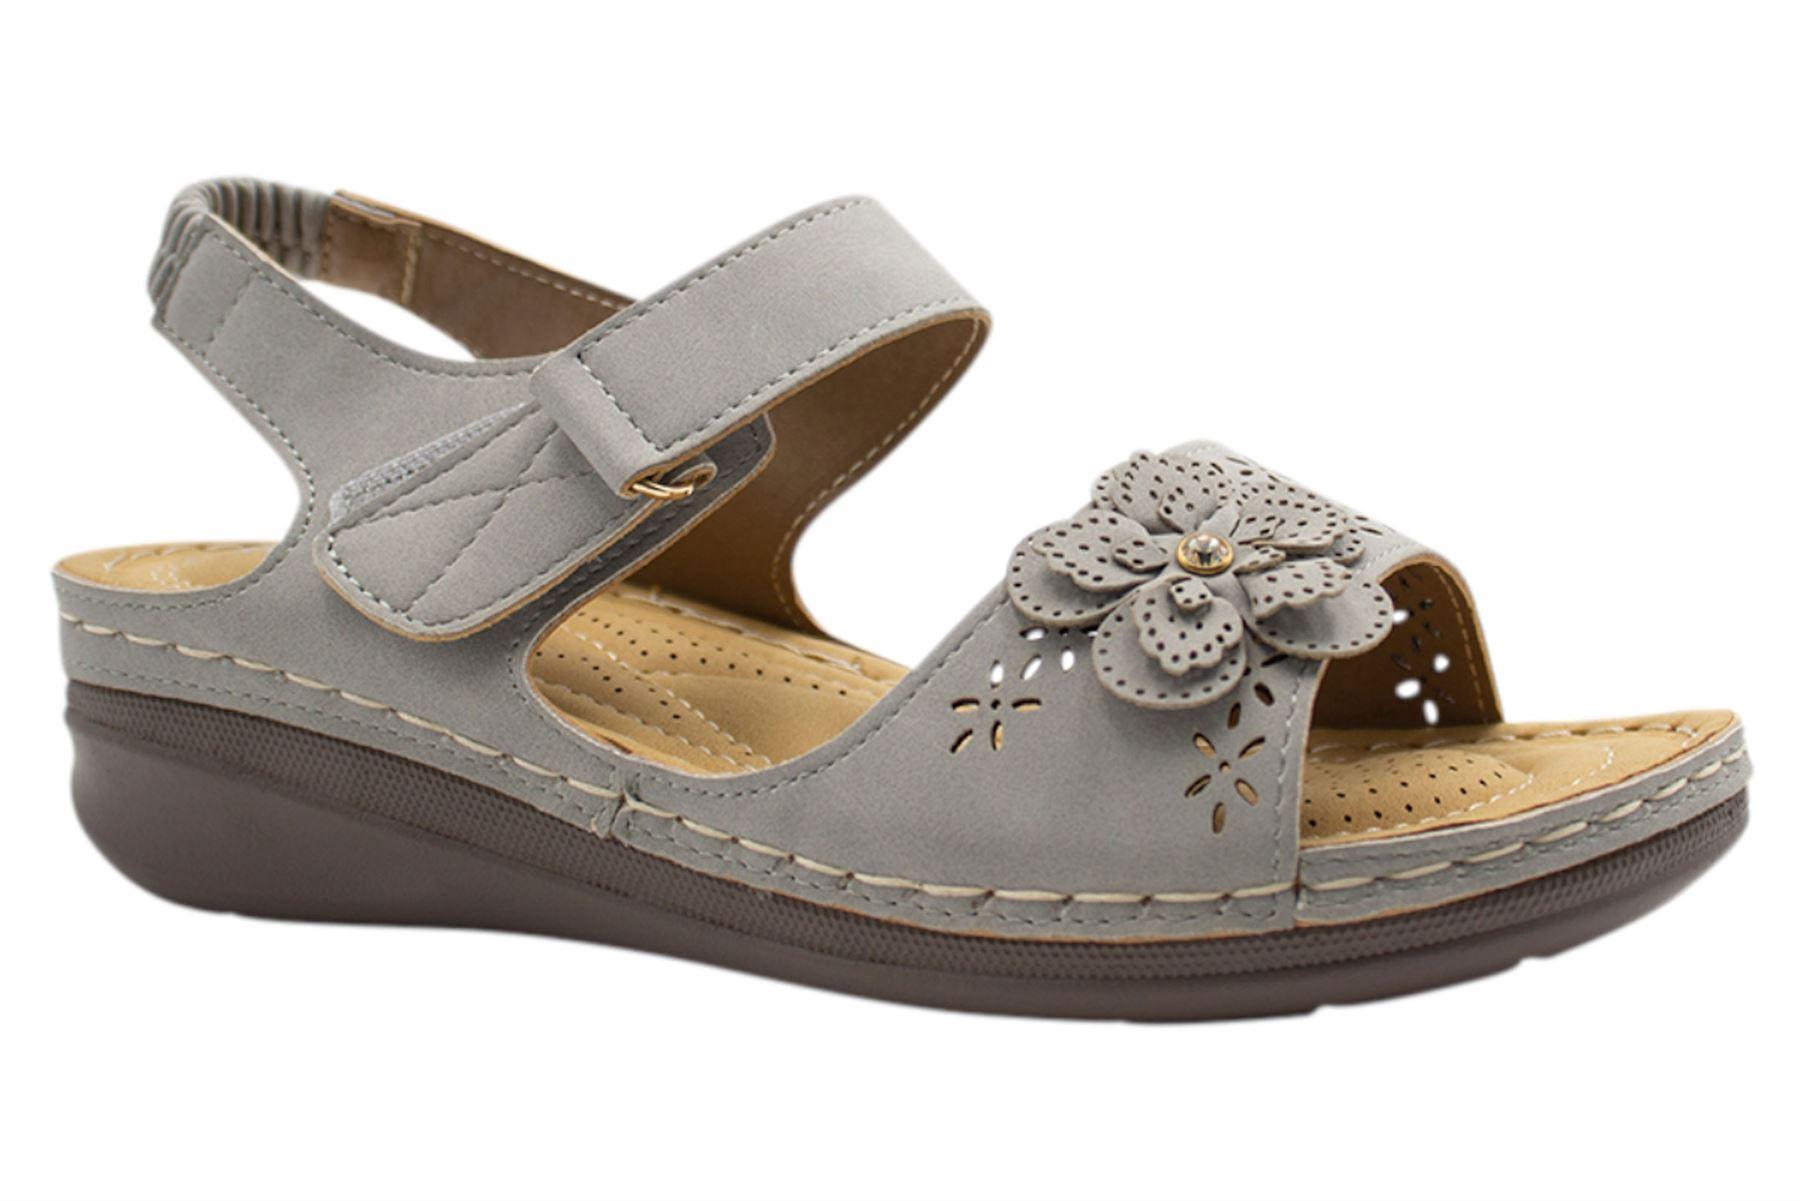 Ladies-Sandals-Womens-Mid-Heel-Comfort-Summer-Beach-Casual-Wear miniatura 25